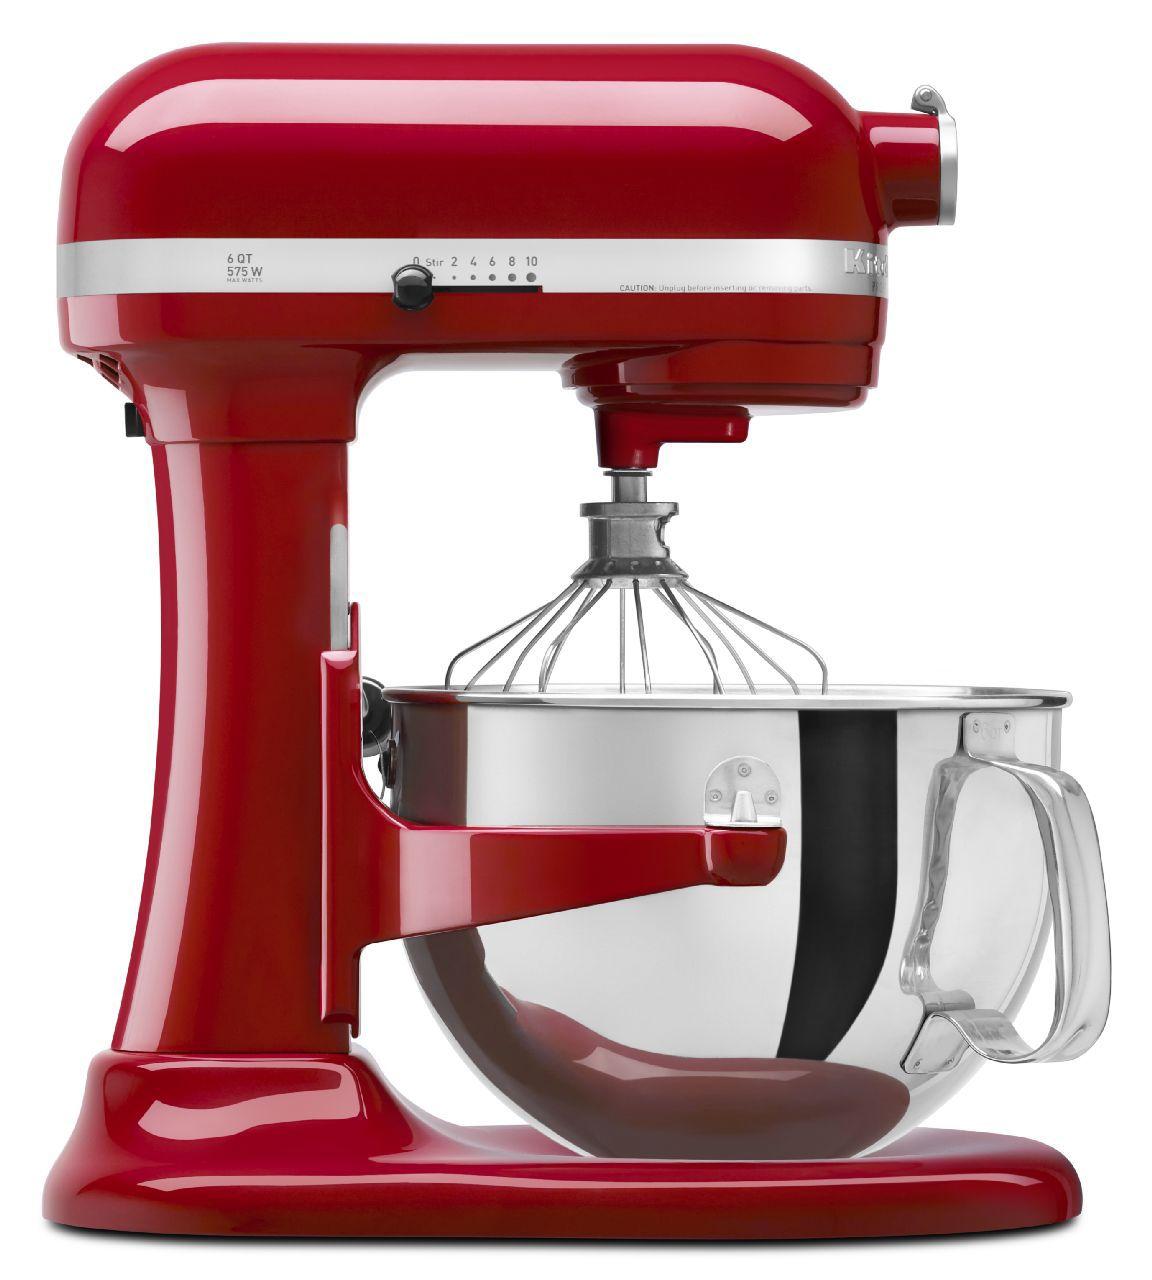 KitchenAid 600 Series Red Stand Mixer